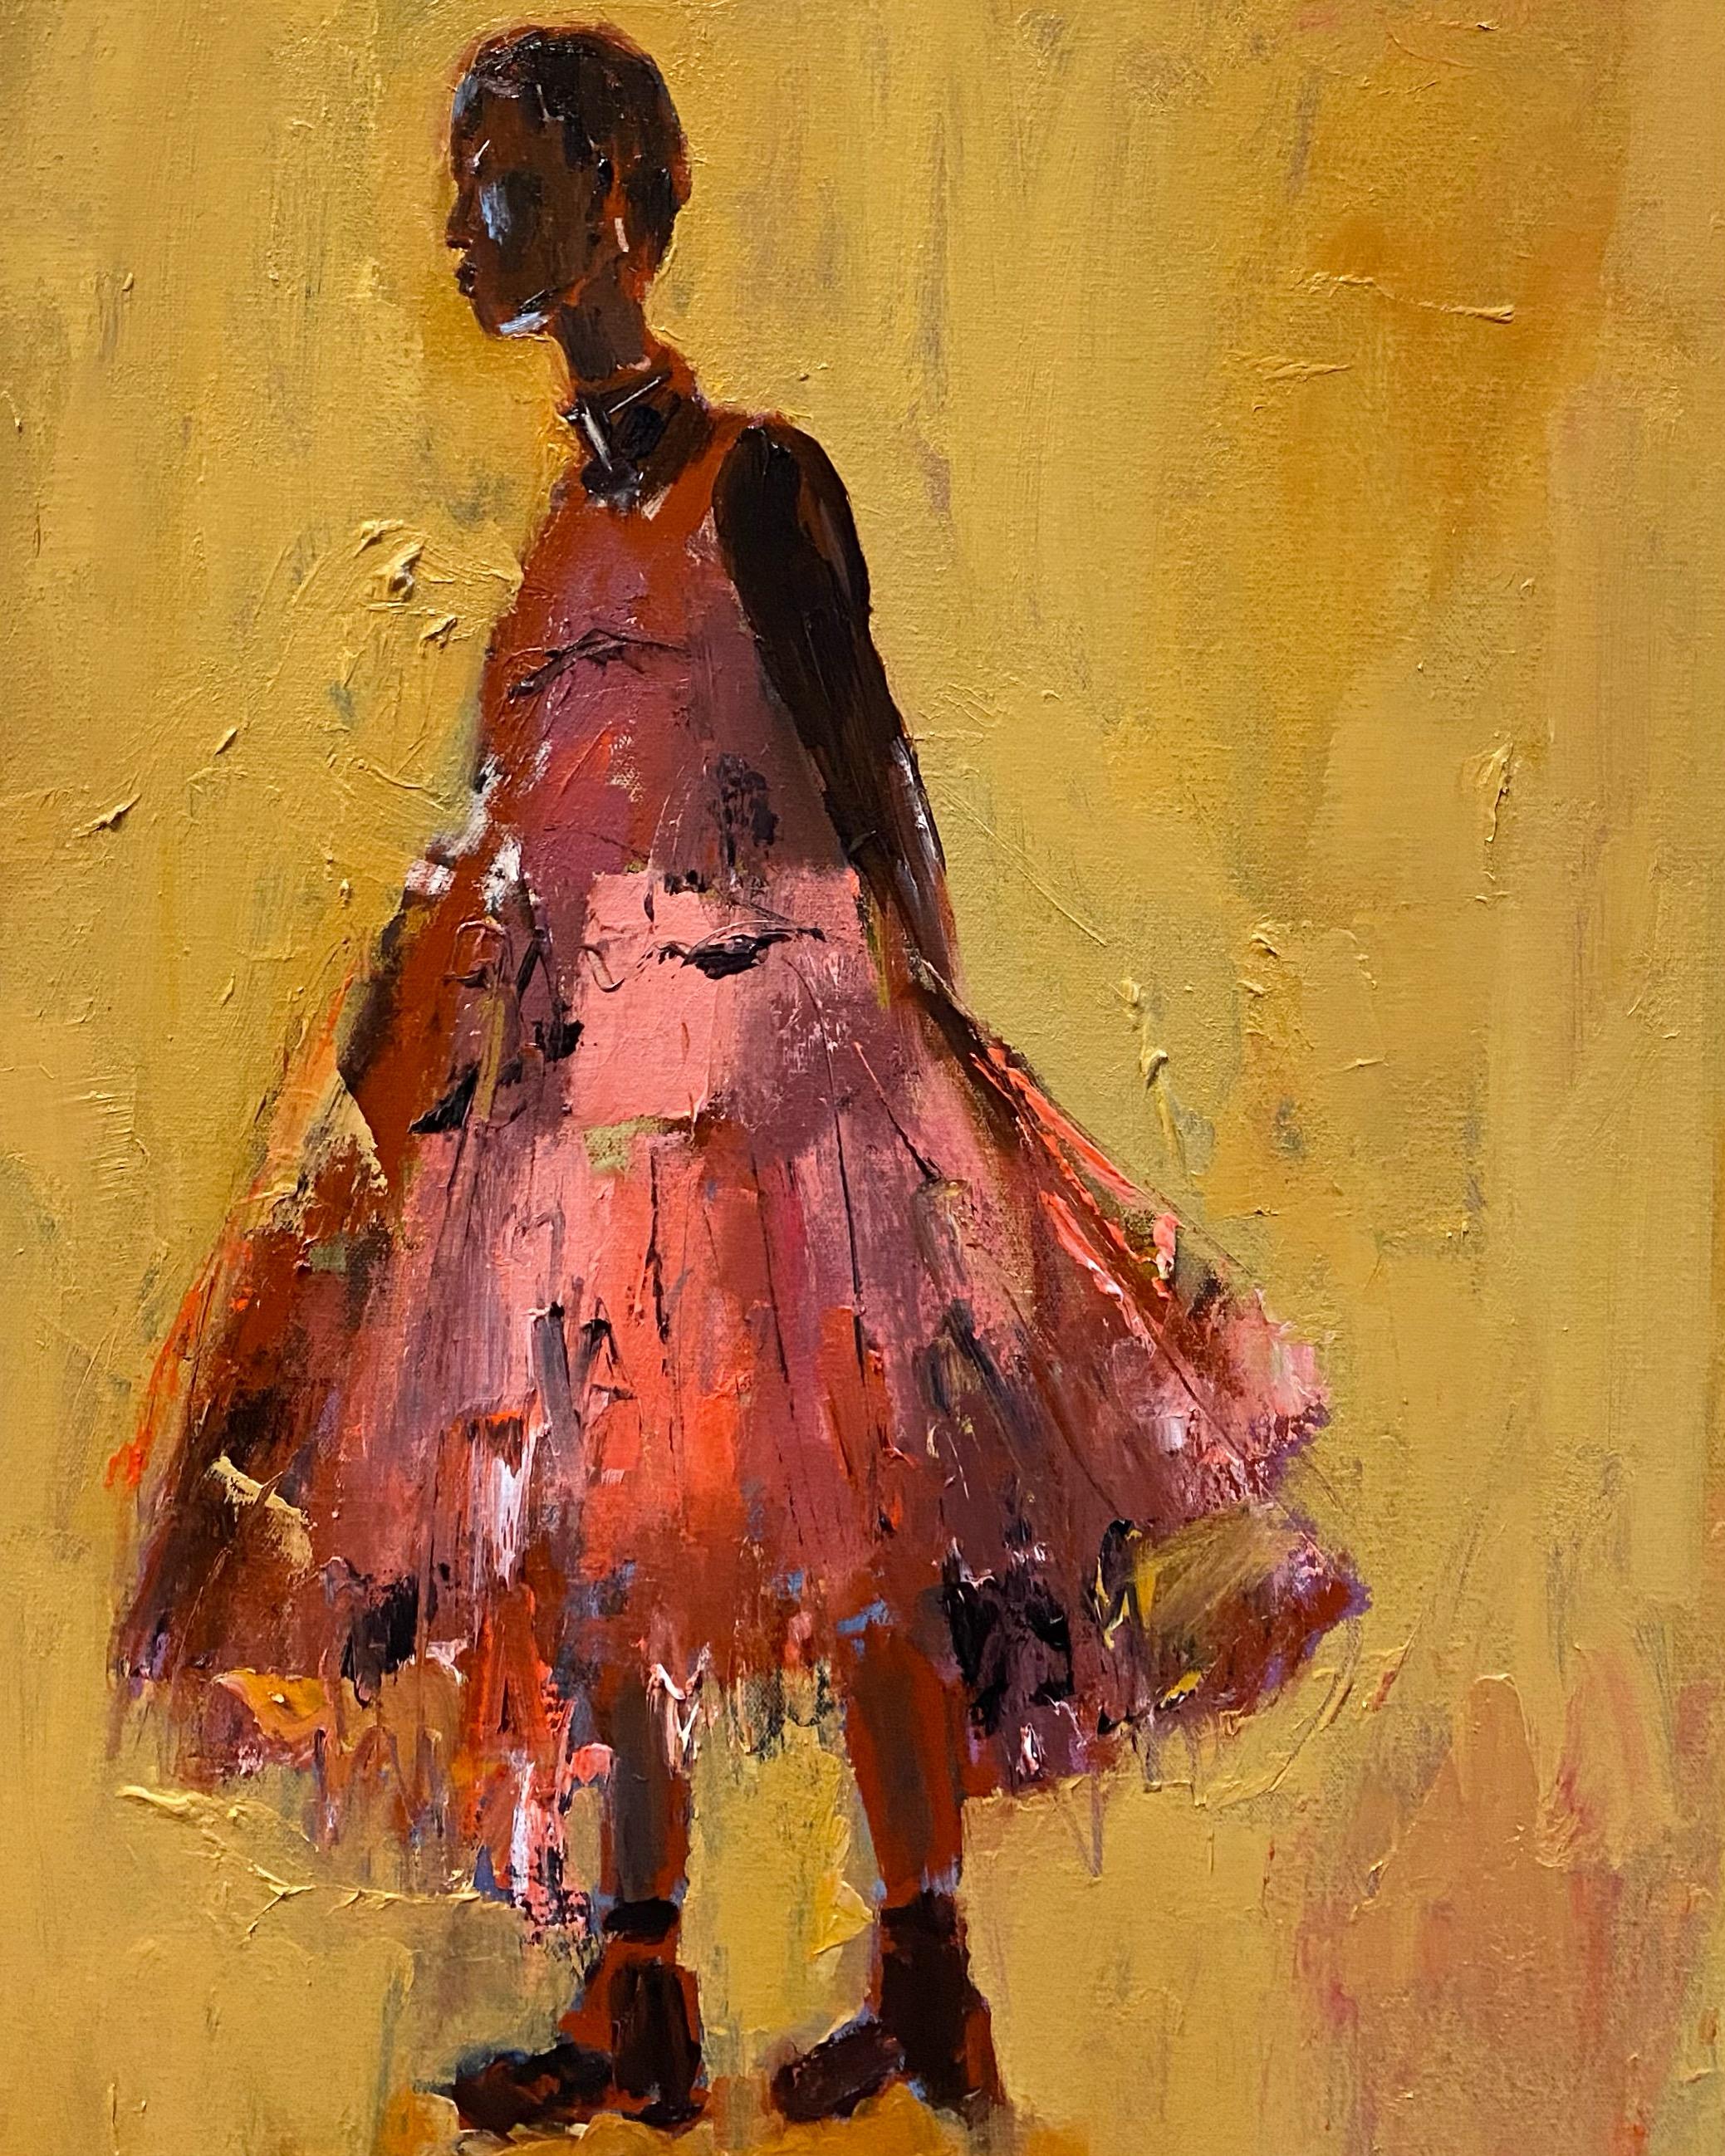 Pink Dress 24x18 o/c